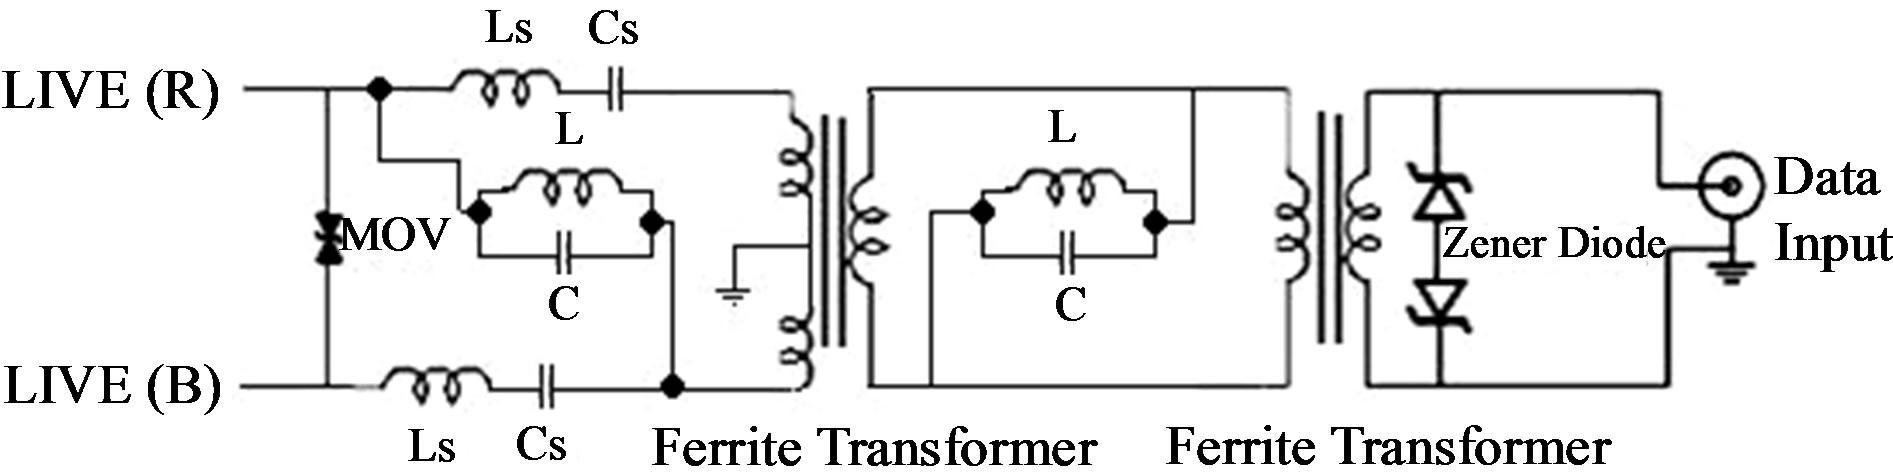 Design Of Bidirectional Coupling Circuit For Broadband Power Line Zener High Voltage Coupler